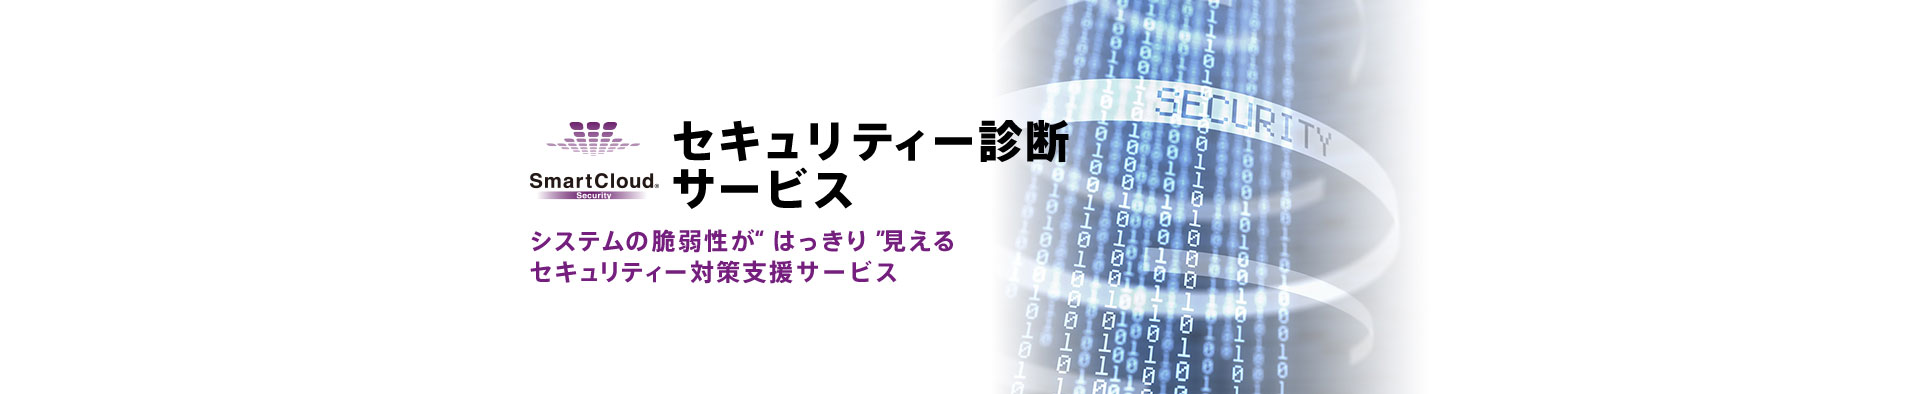 SmartCloud  セキュリティー診断サービスのイメージ